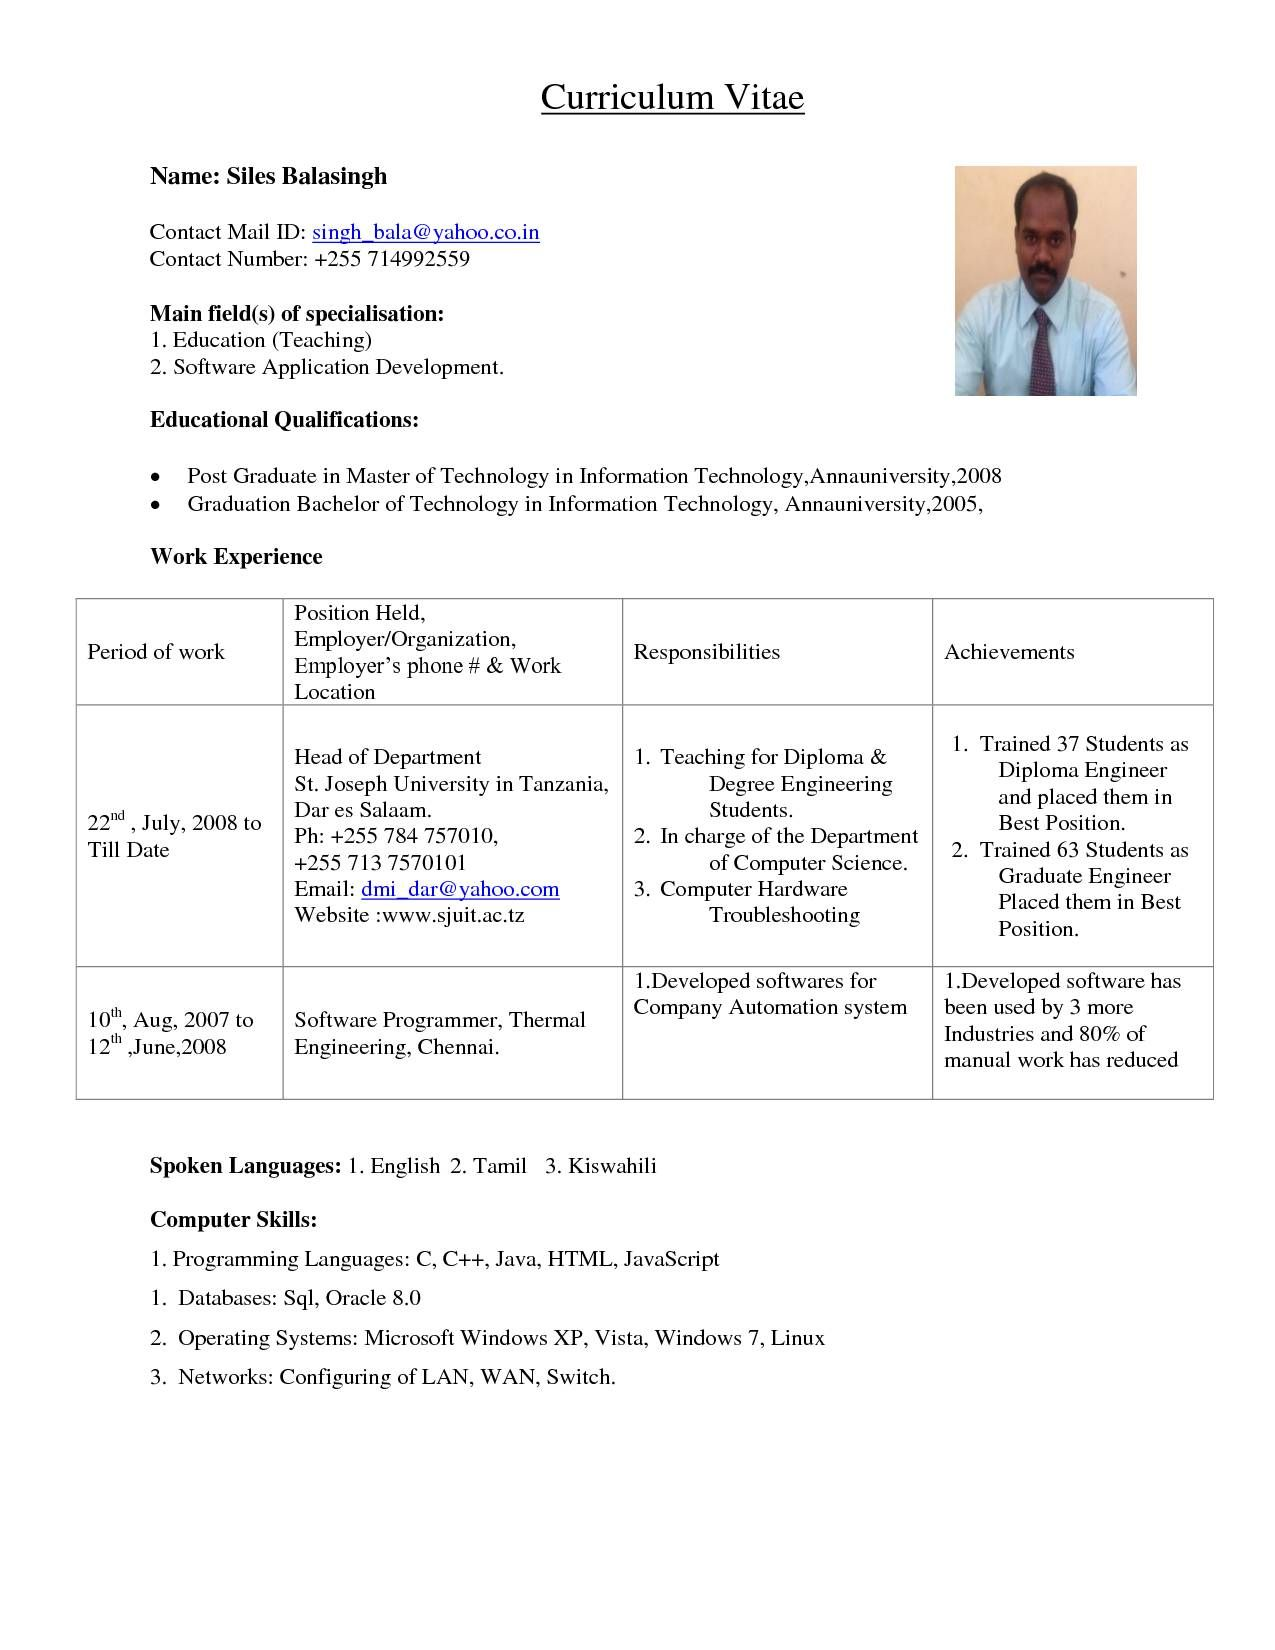 Sample Resume Format For Assistant Professor In Engineering